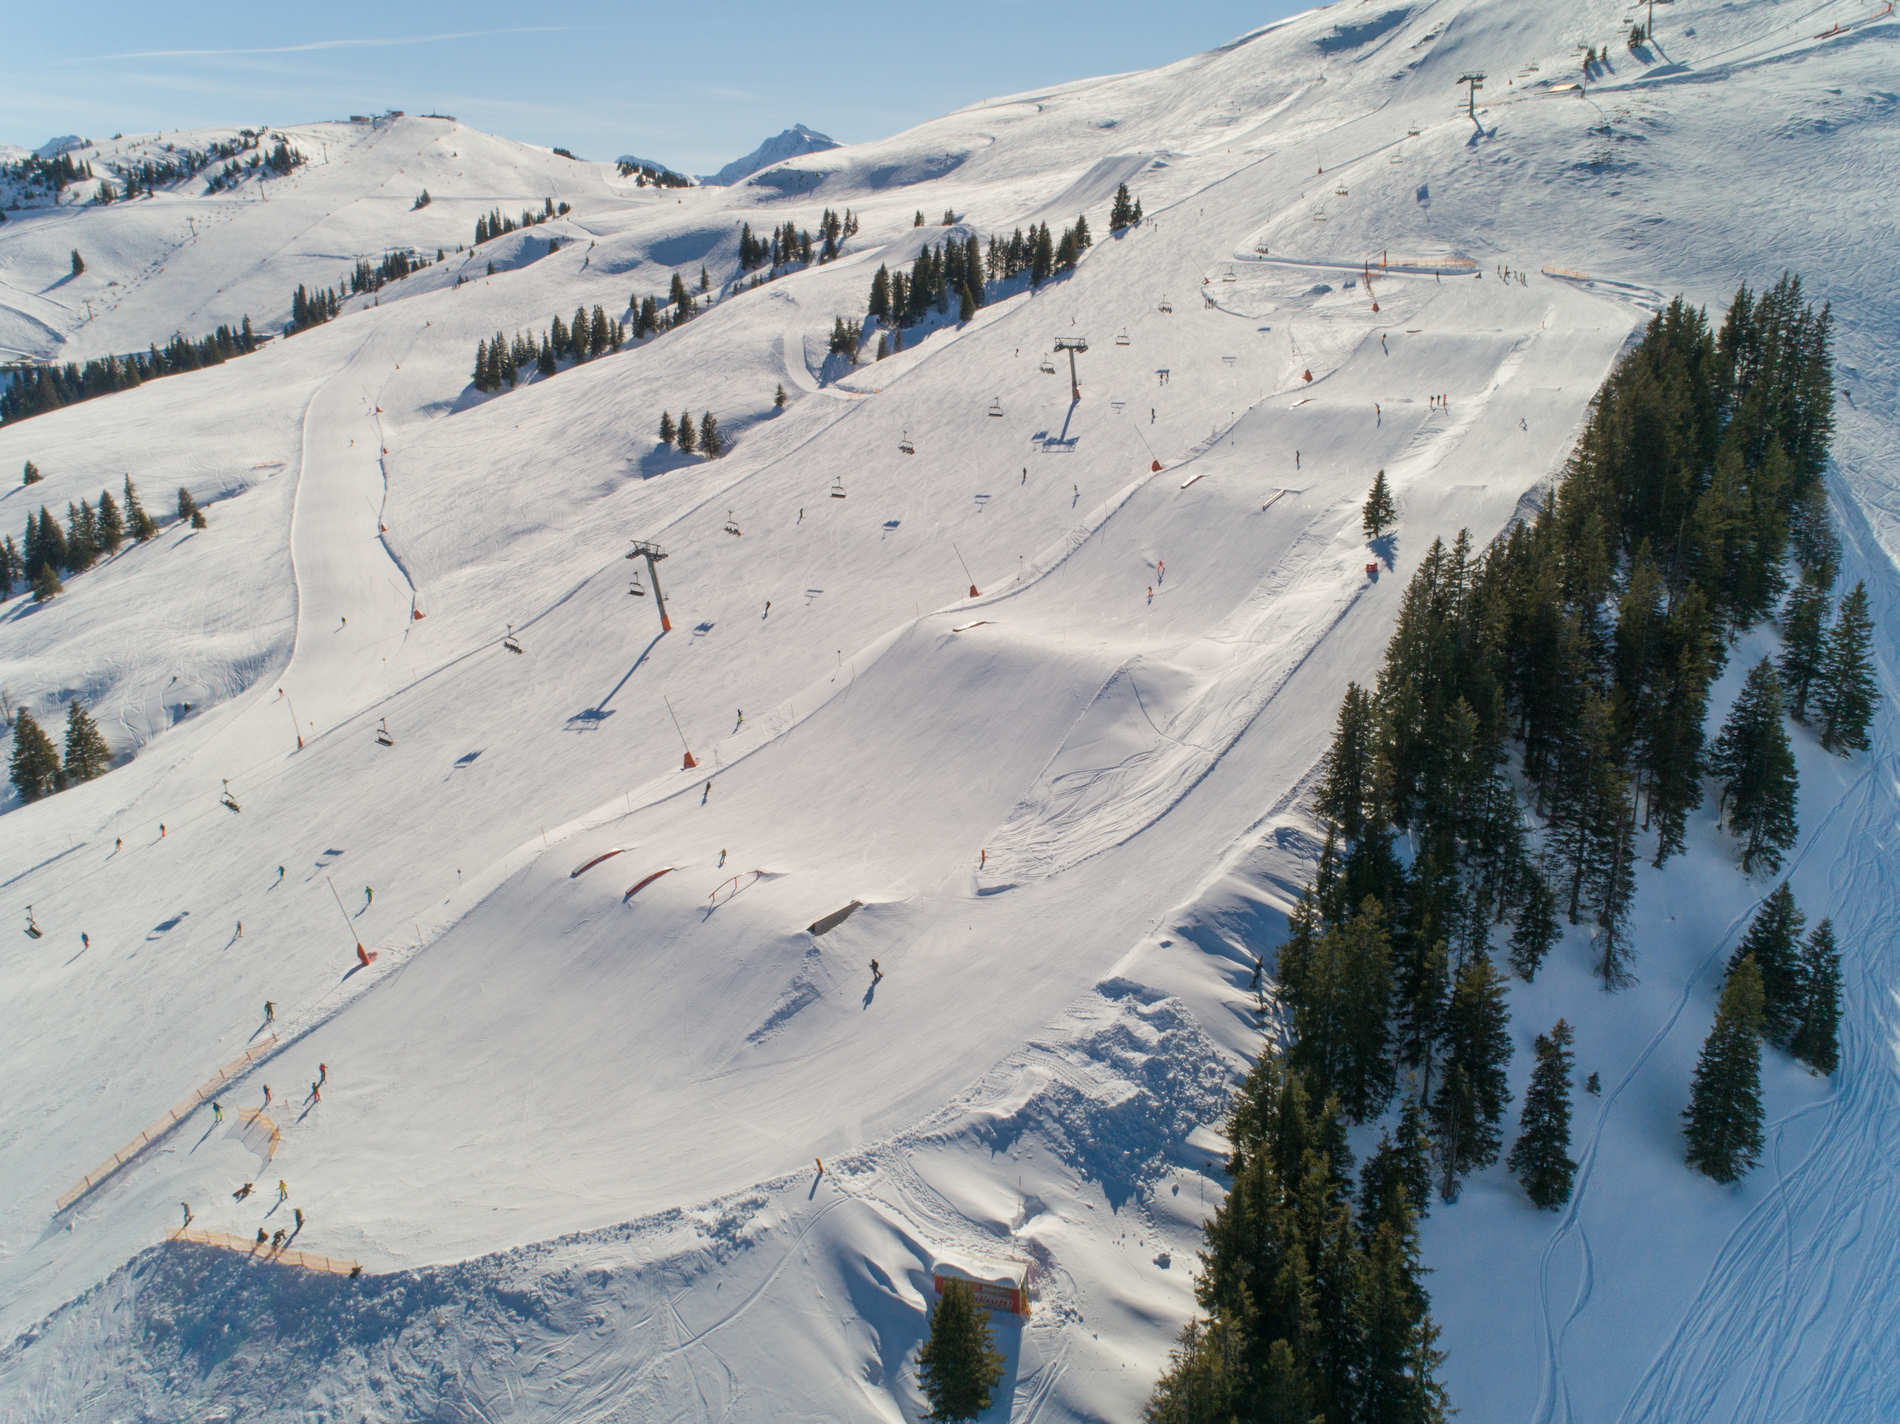 web aerials snowpark kitzbuehel michi rudolf 9